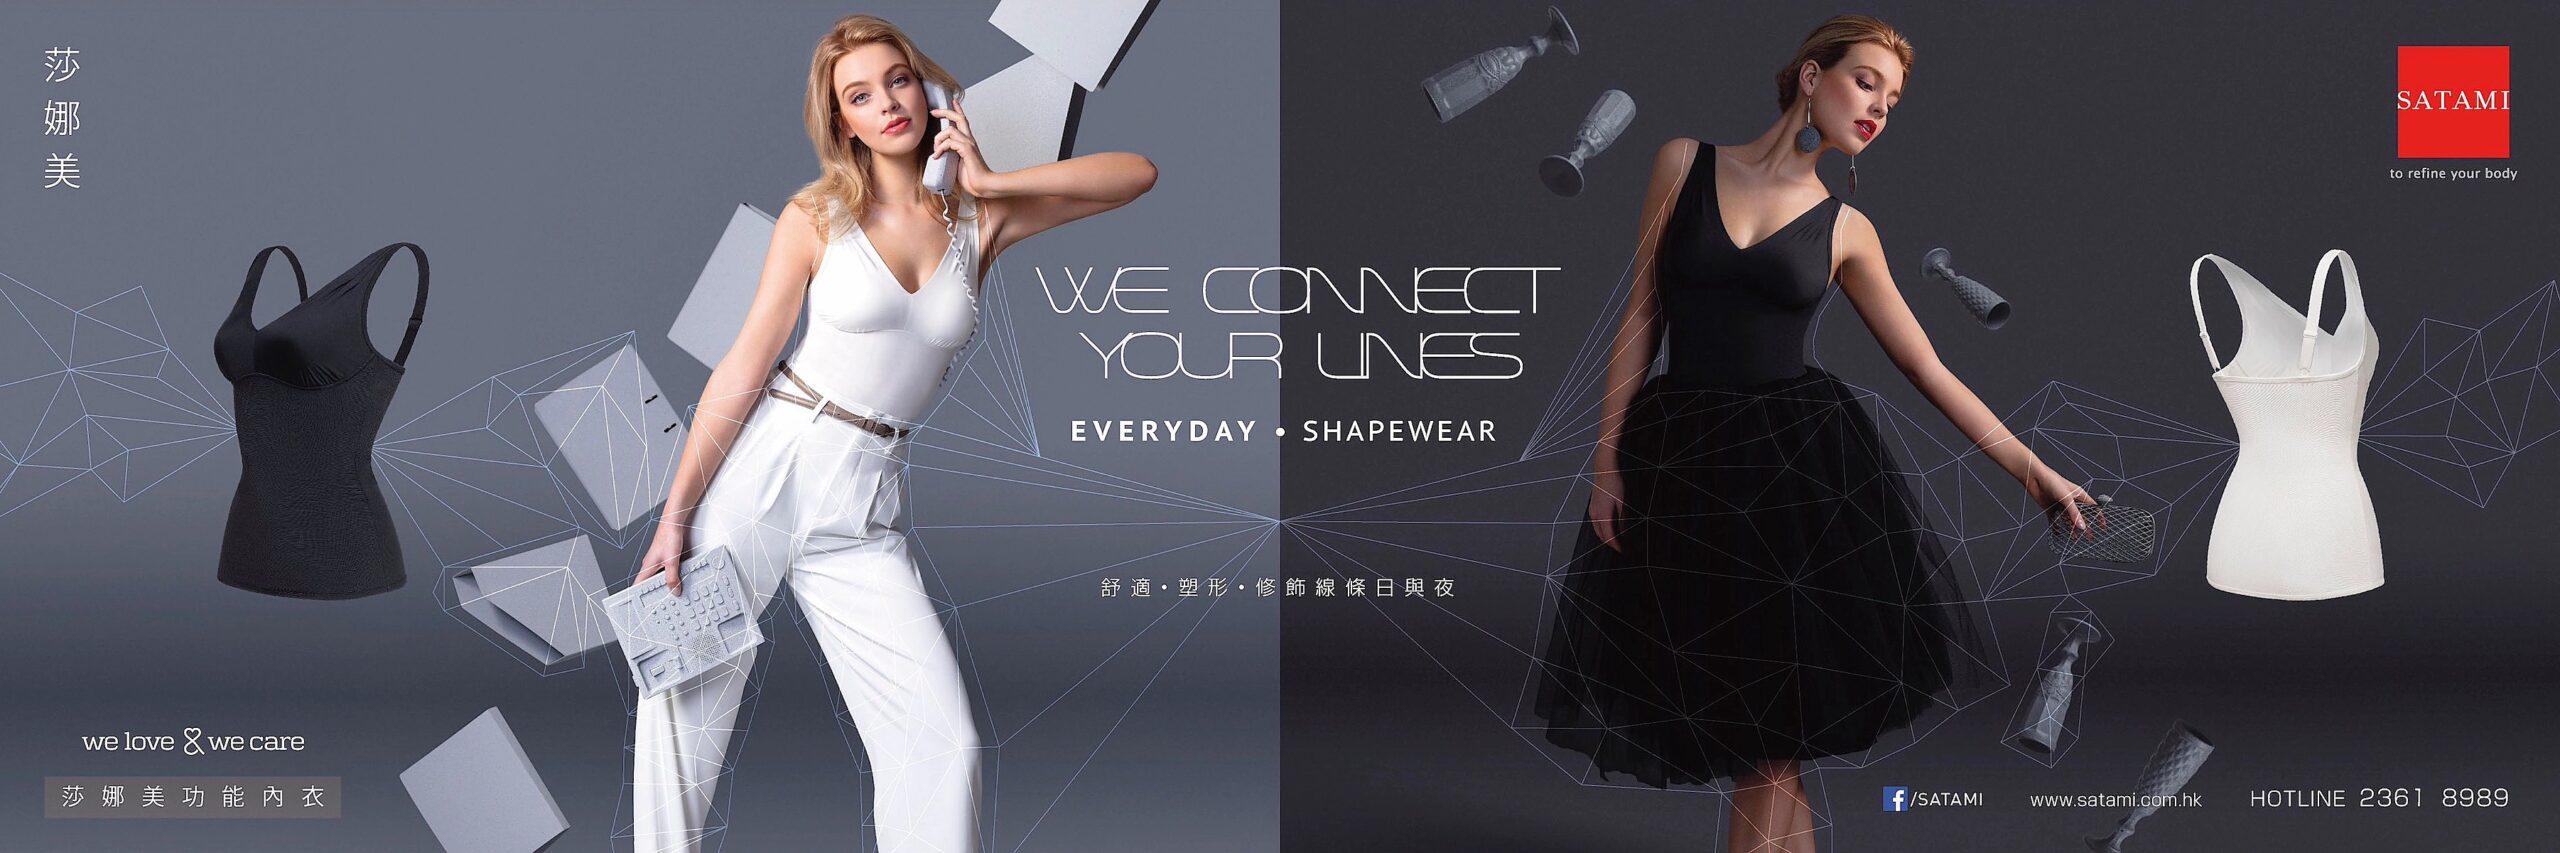 Satami Shapewear Ss18 02